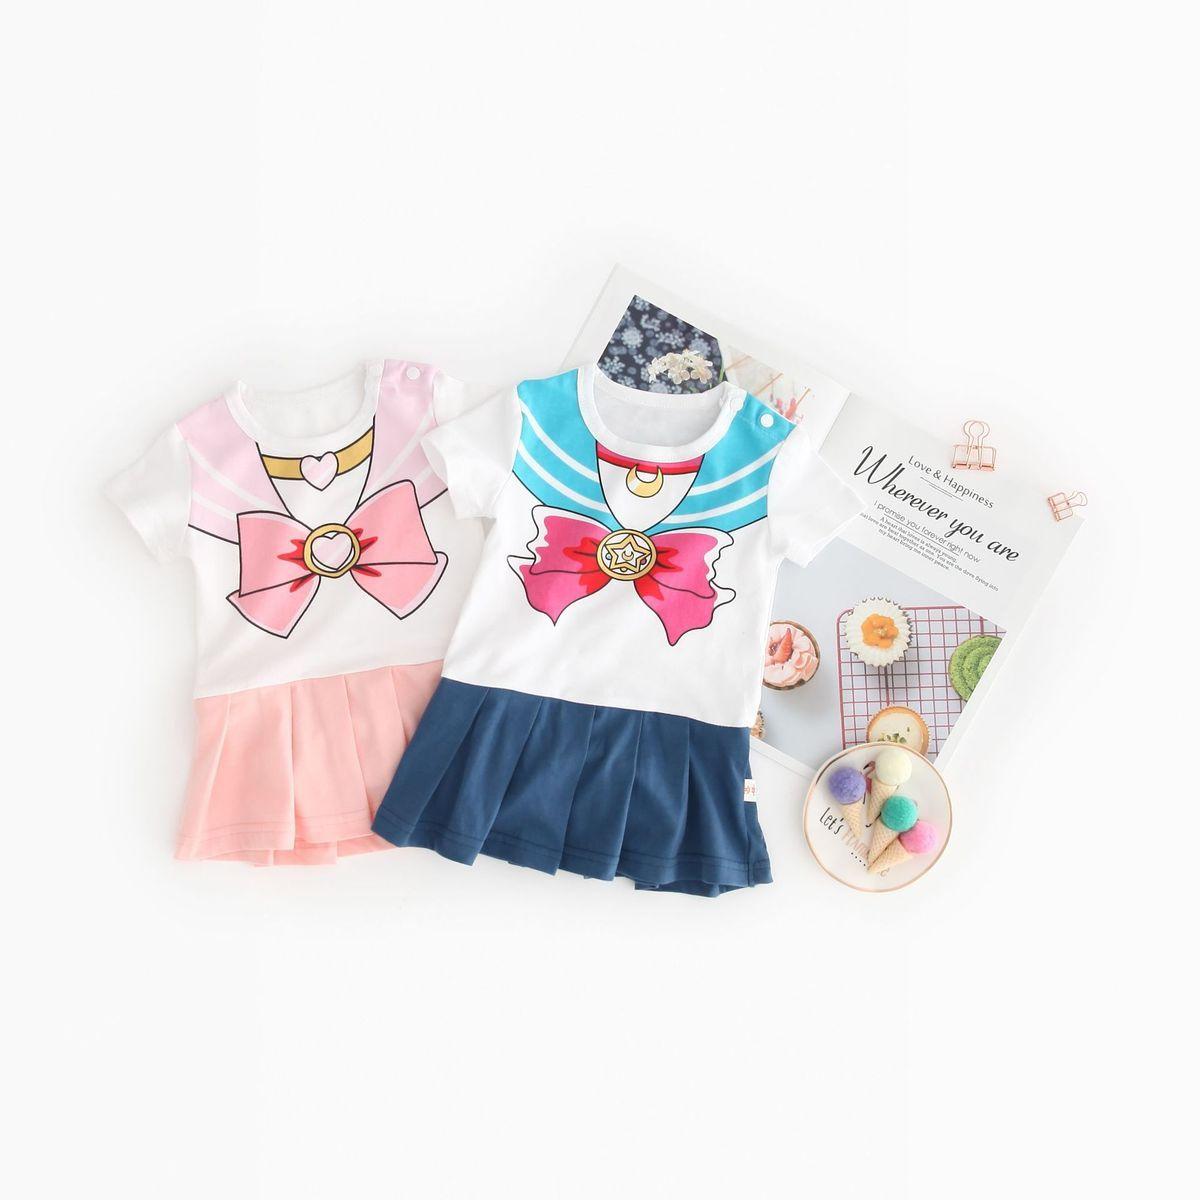 Baby Jumpsuit beautiful girl warrior baby dress pure cotton baby girl skirt ha dress water ice moon Jumpsuit